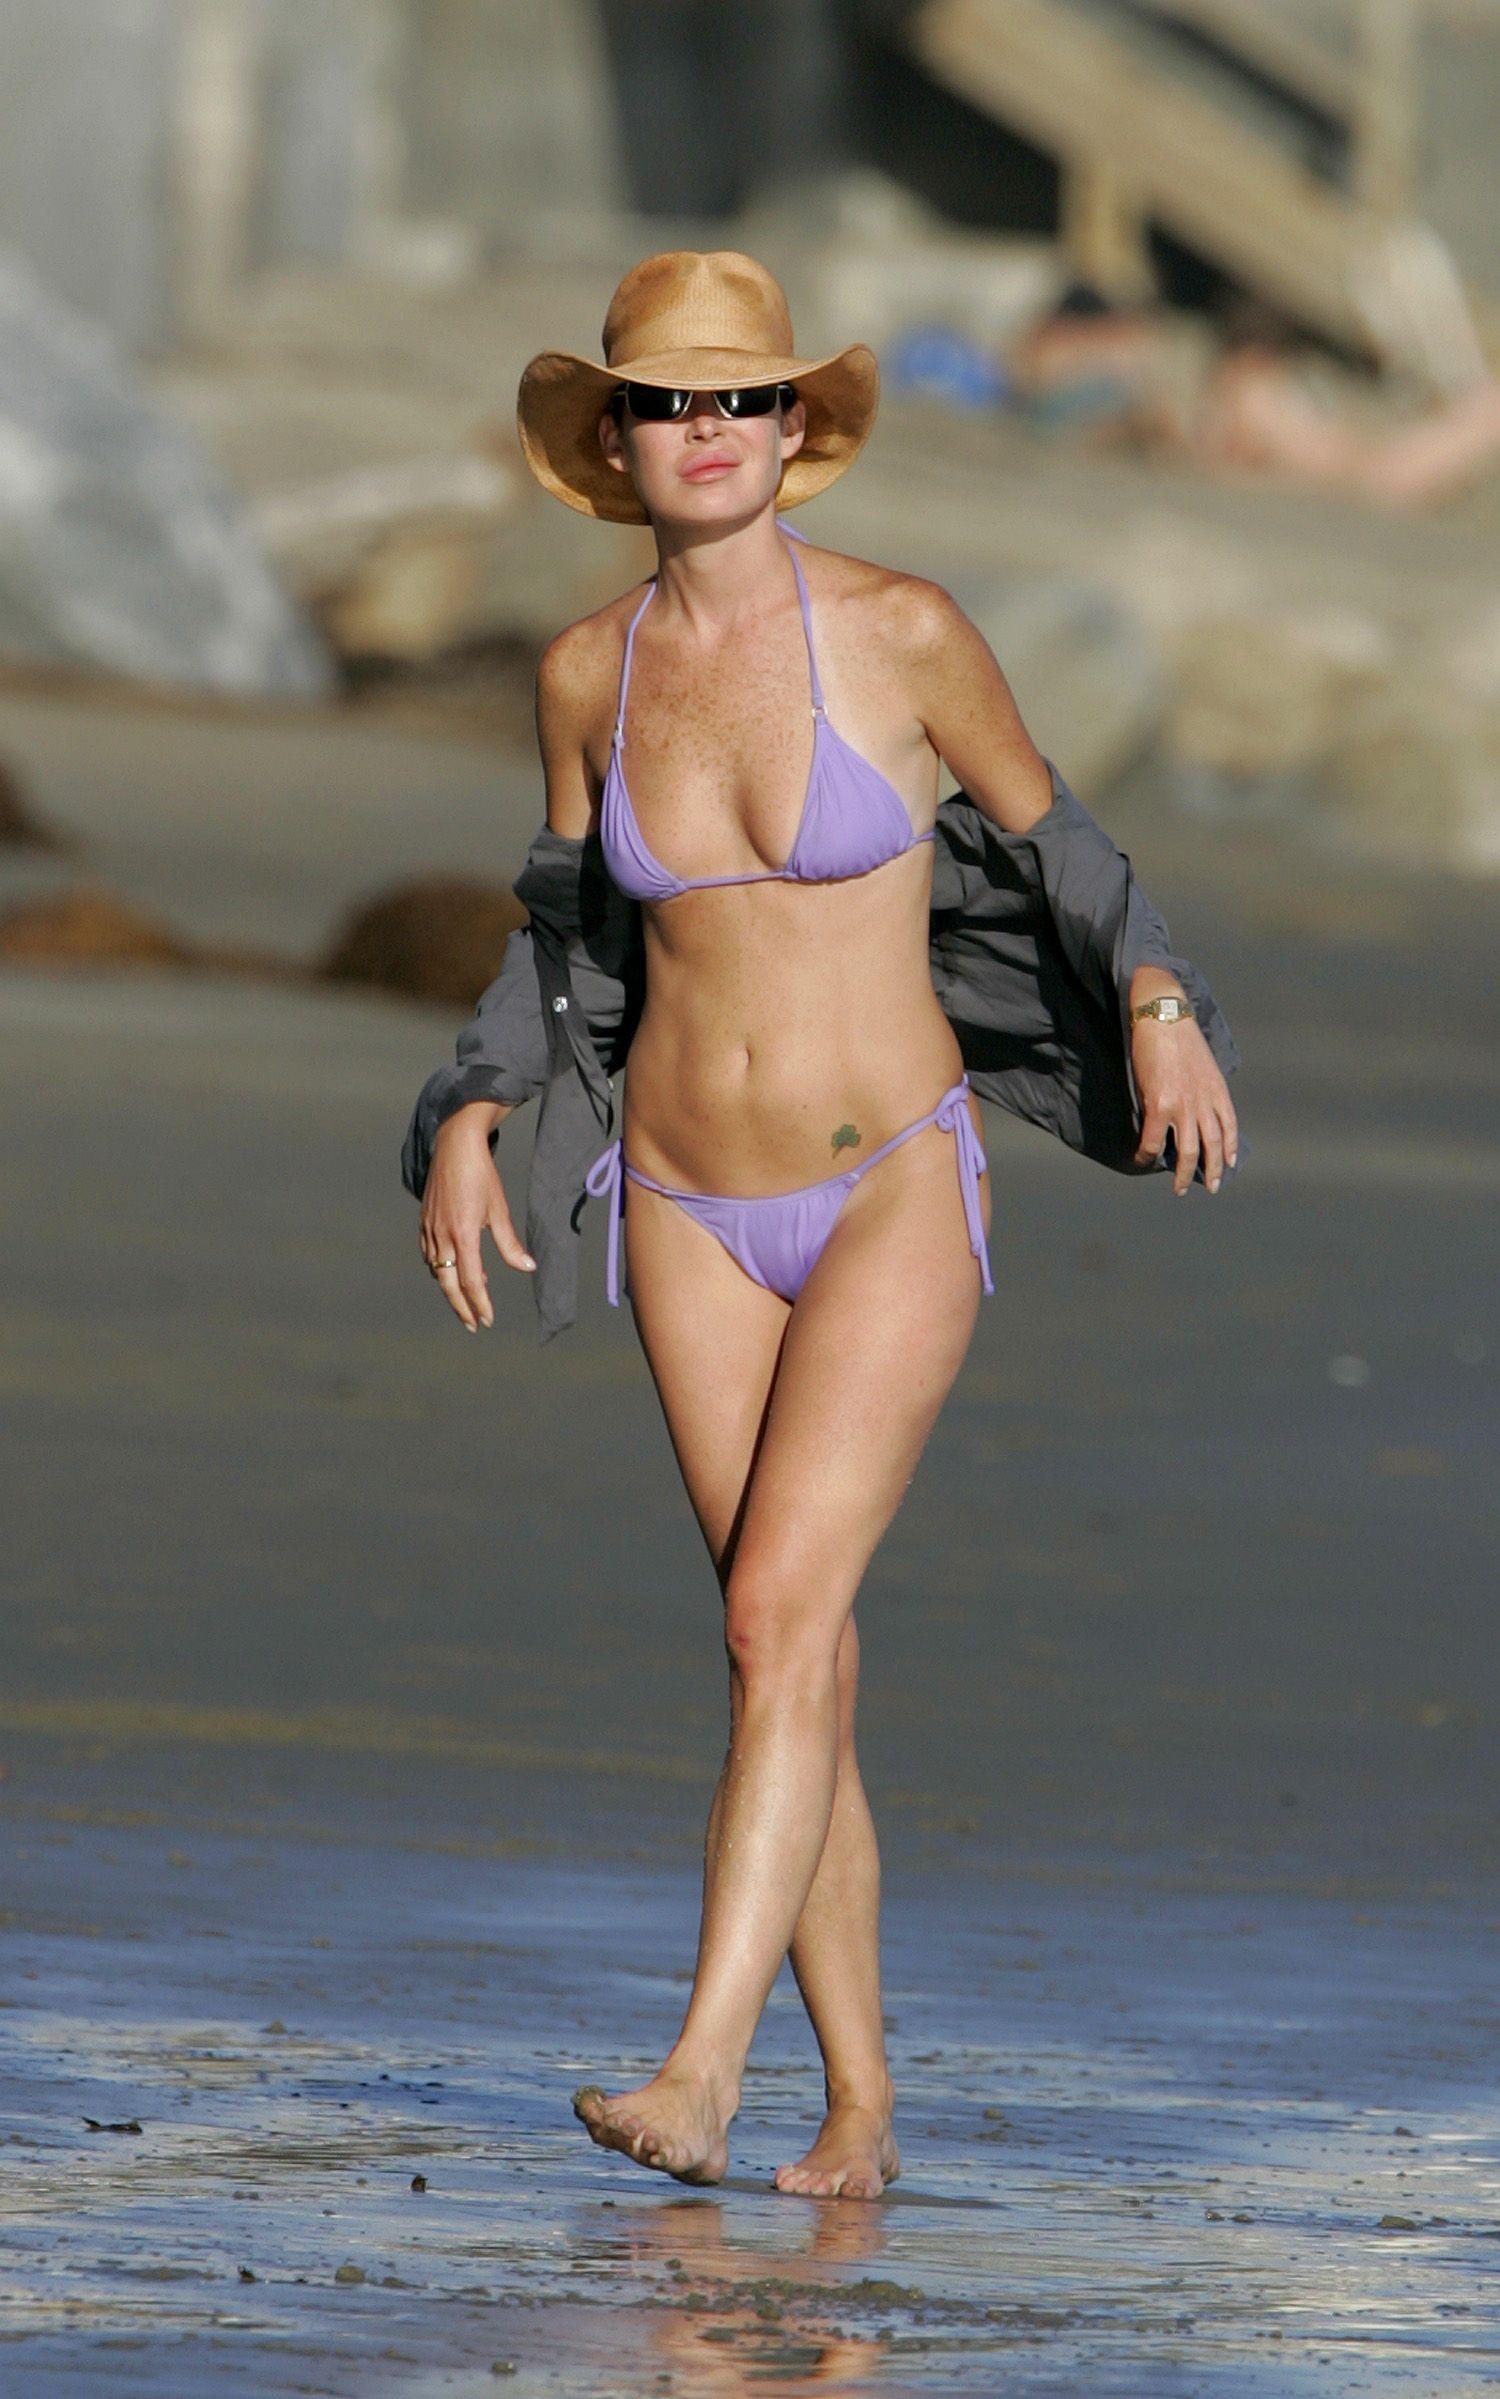 Bikini boyle flynn lara